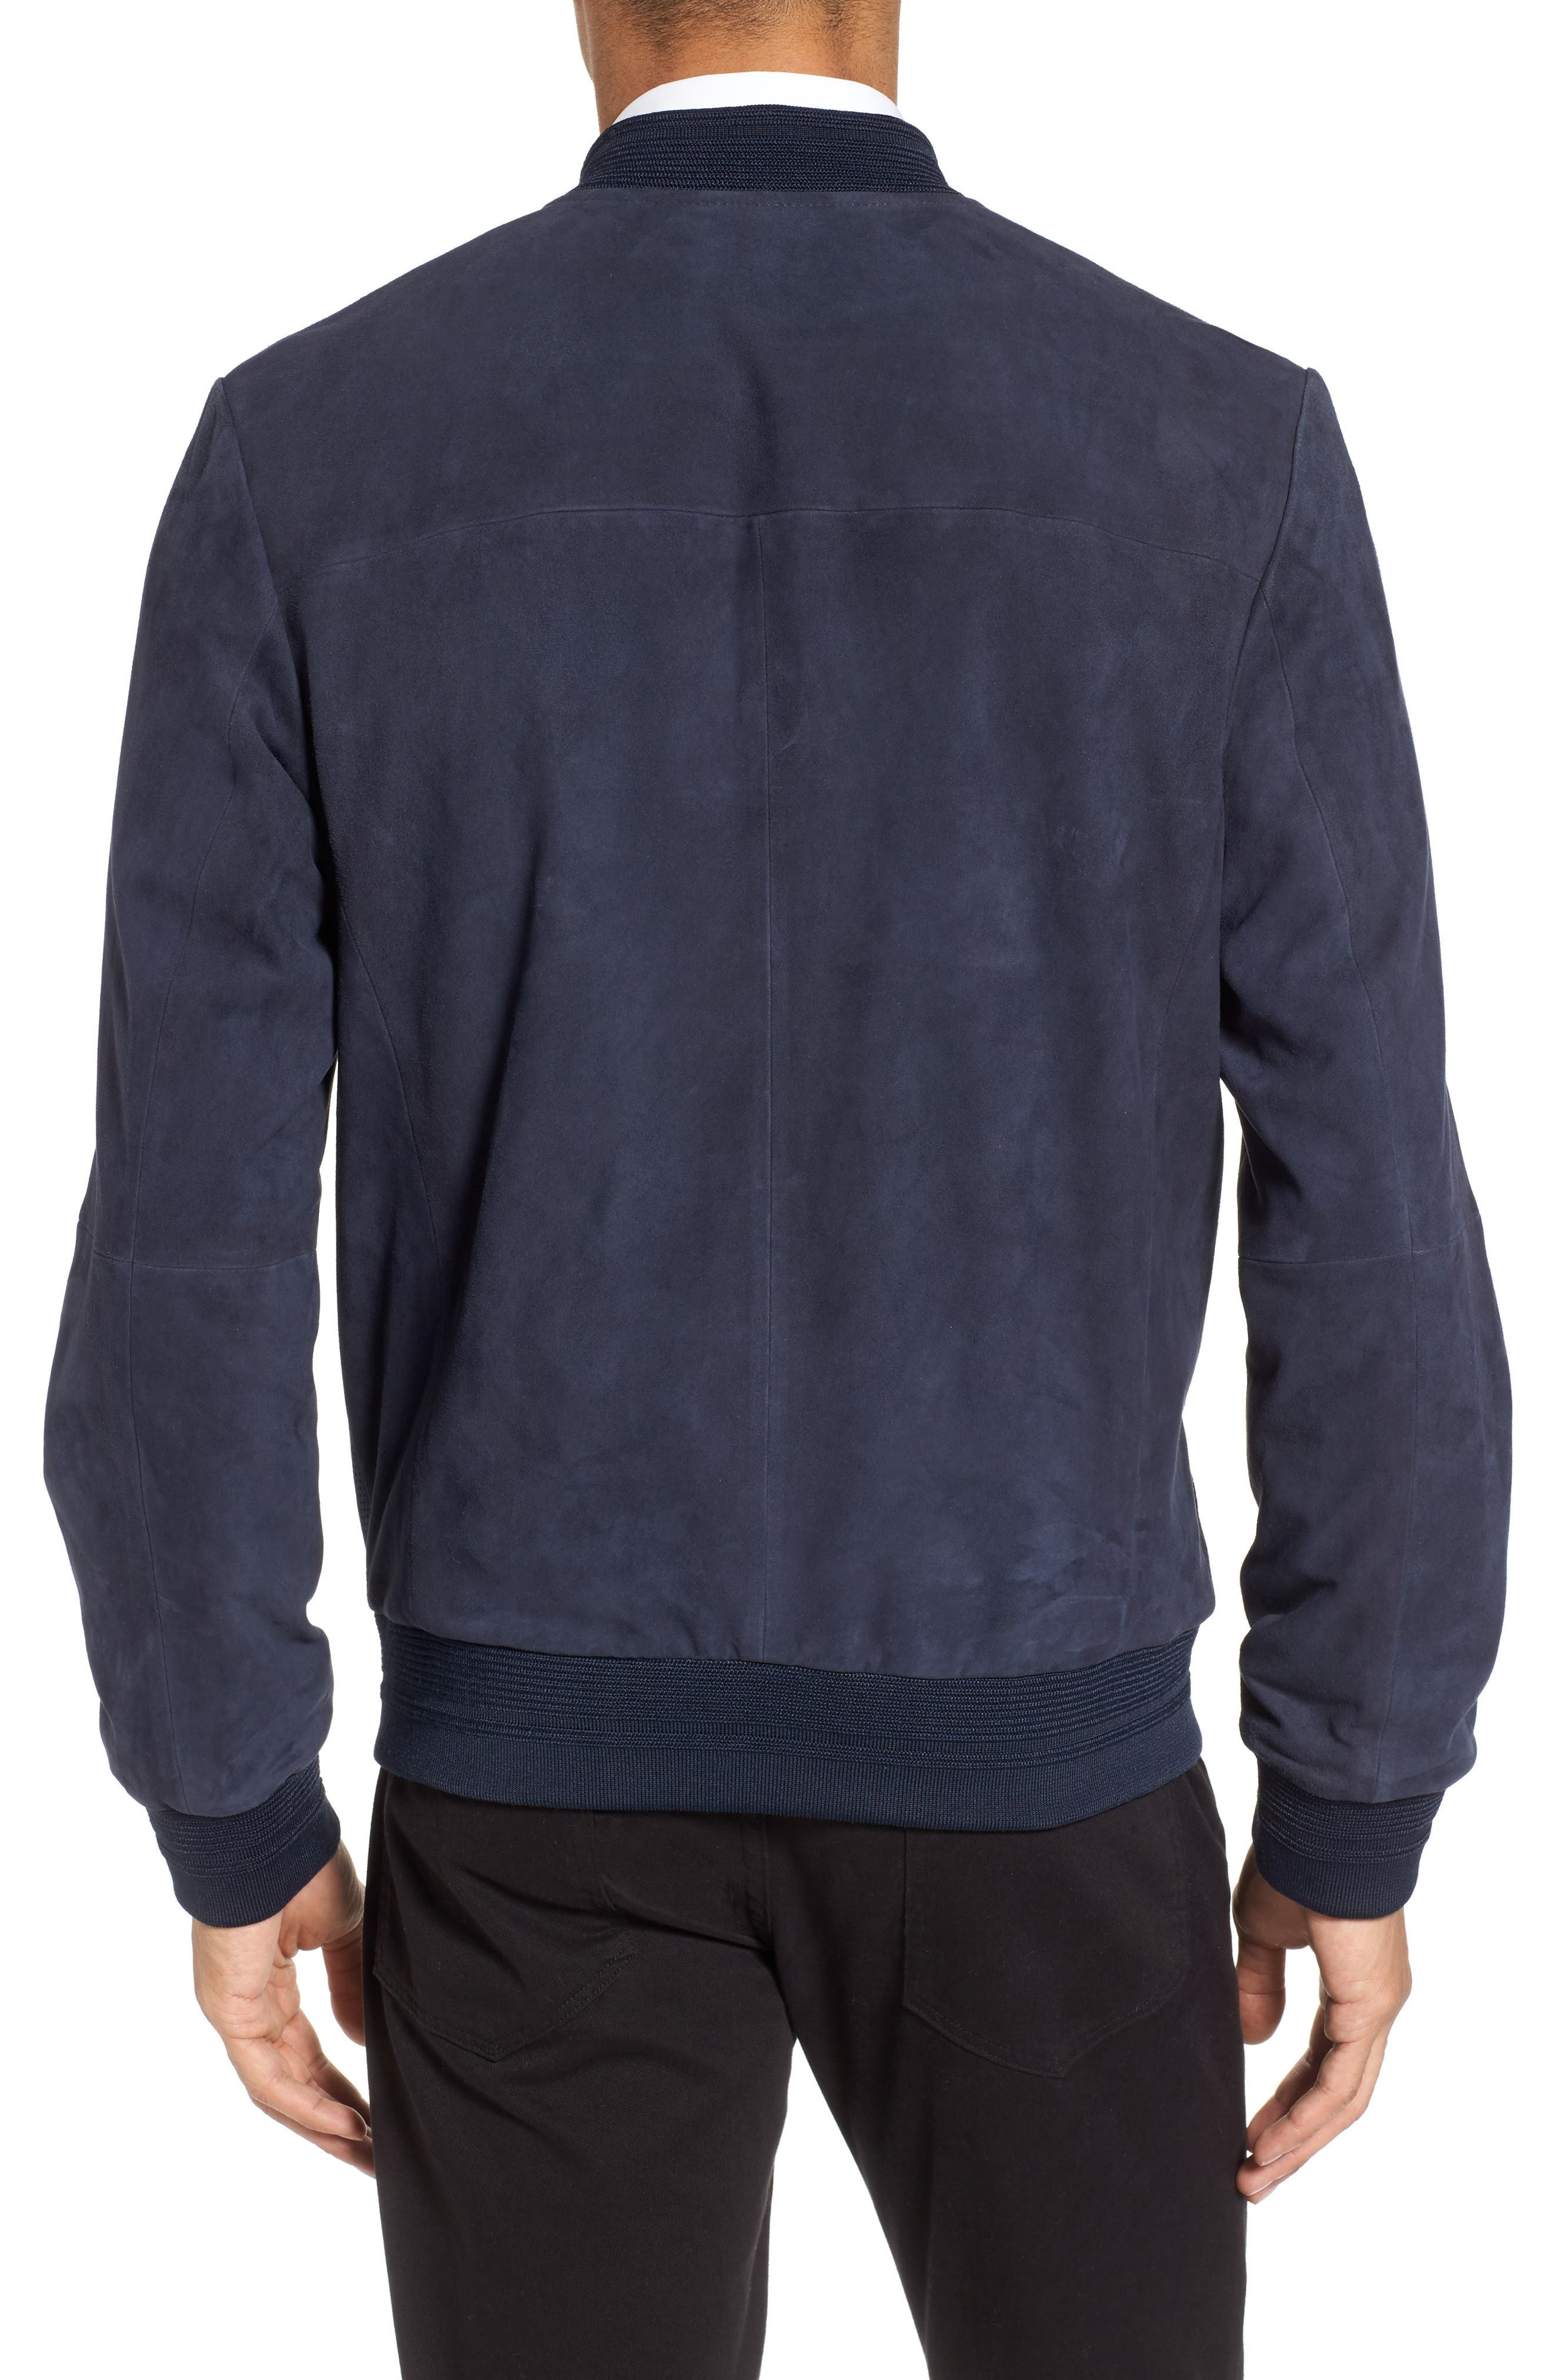 Suede Bomber Jacket,                             Alternate thumbnail 2, color,                             Navy Blue